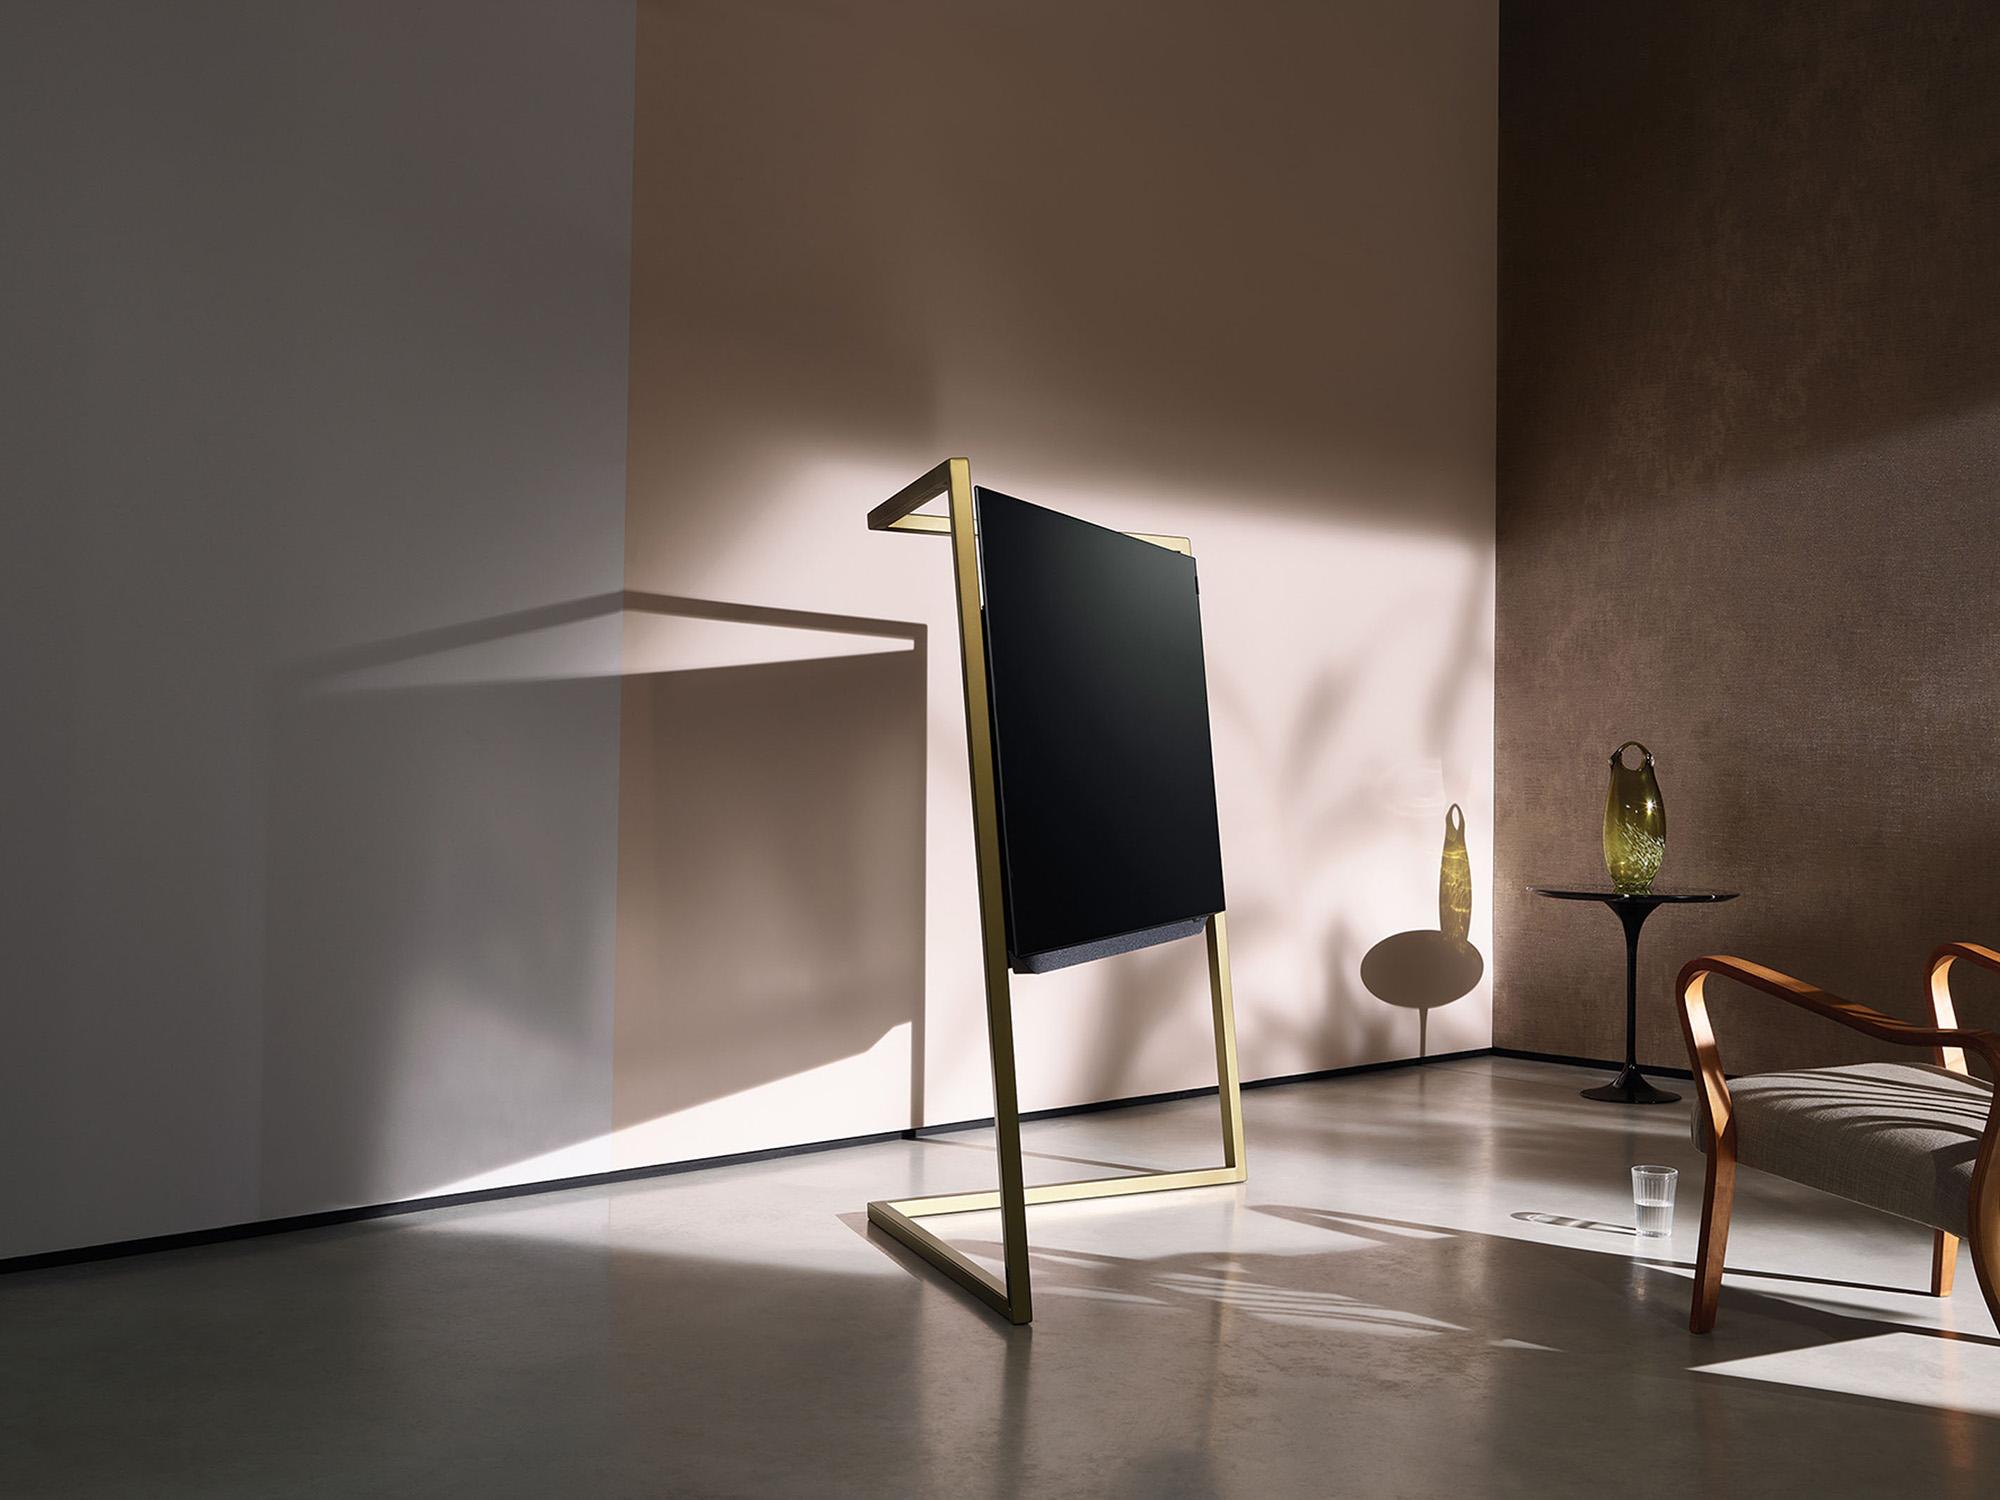 Bild_55-floorstand-Graphite_0015_Gold_rgb_150dpi-Large-01.jpg